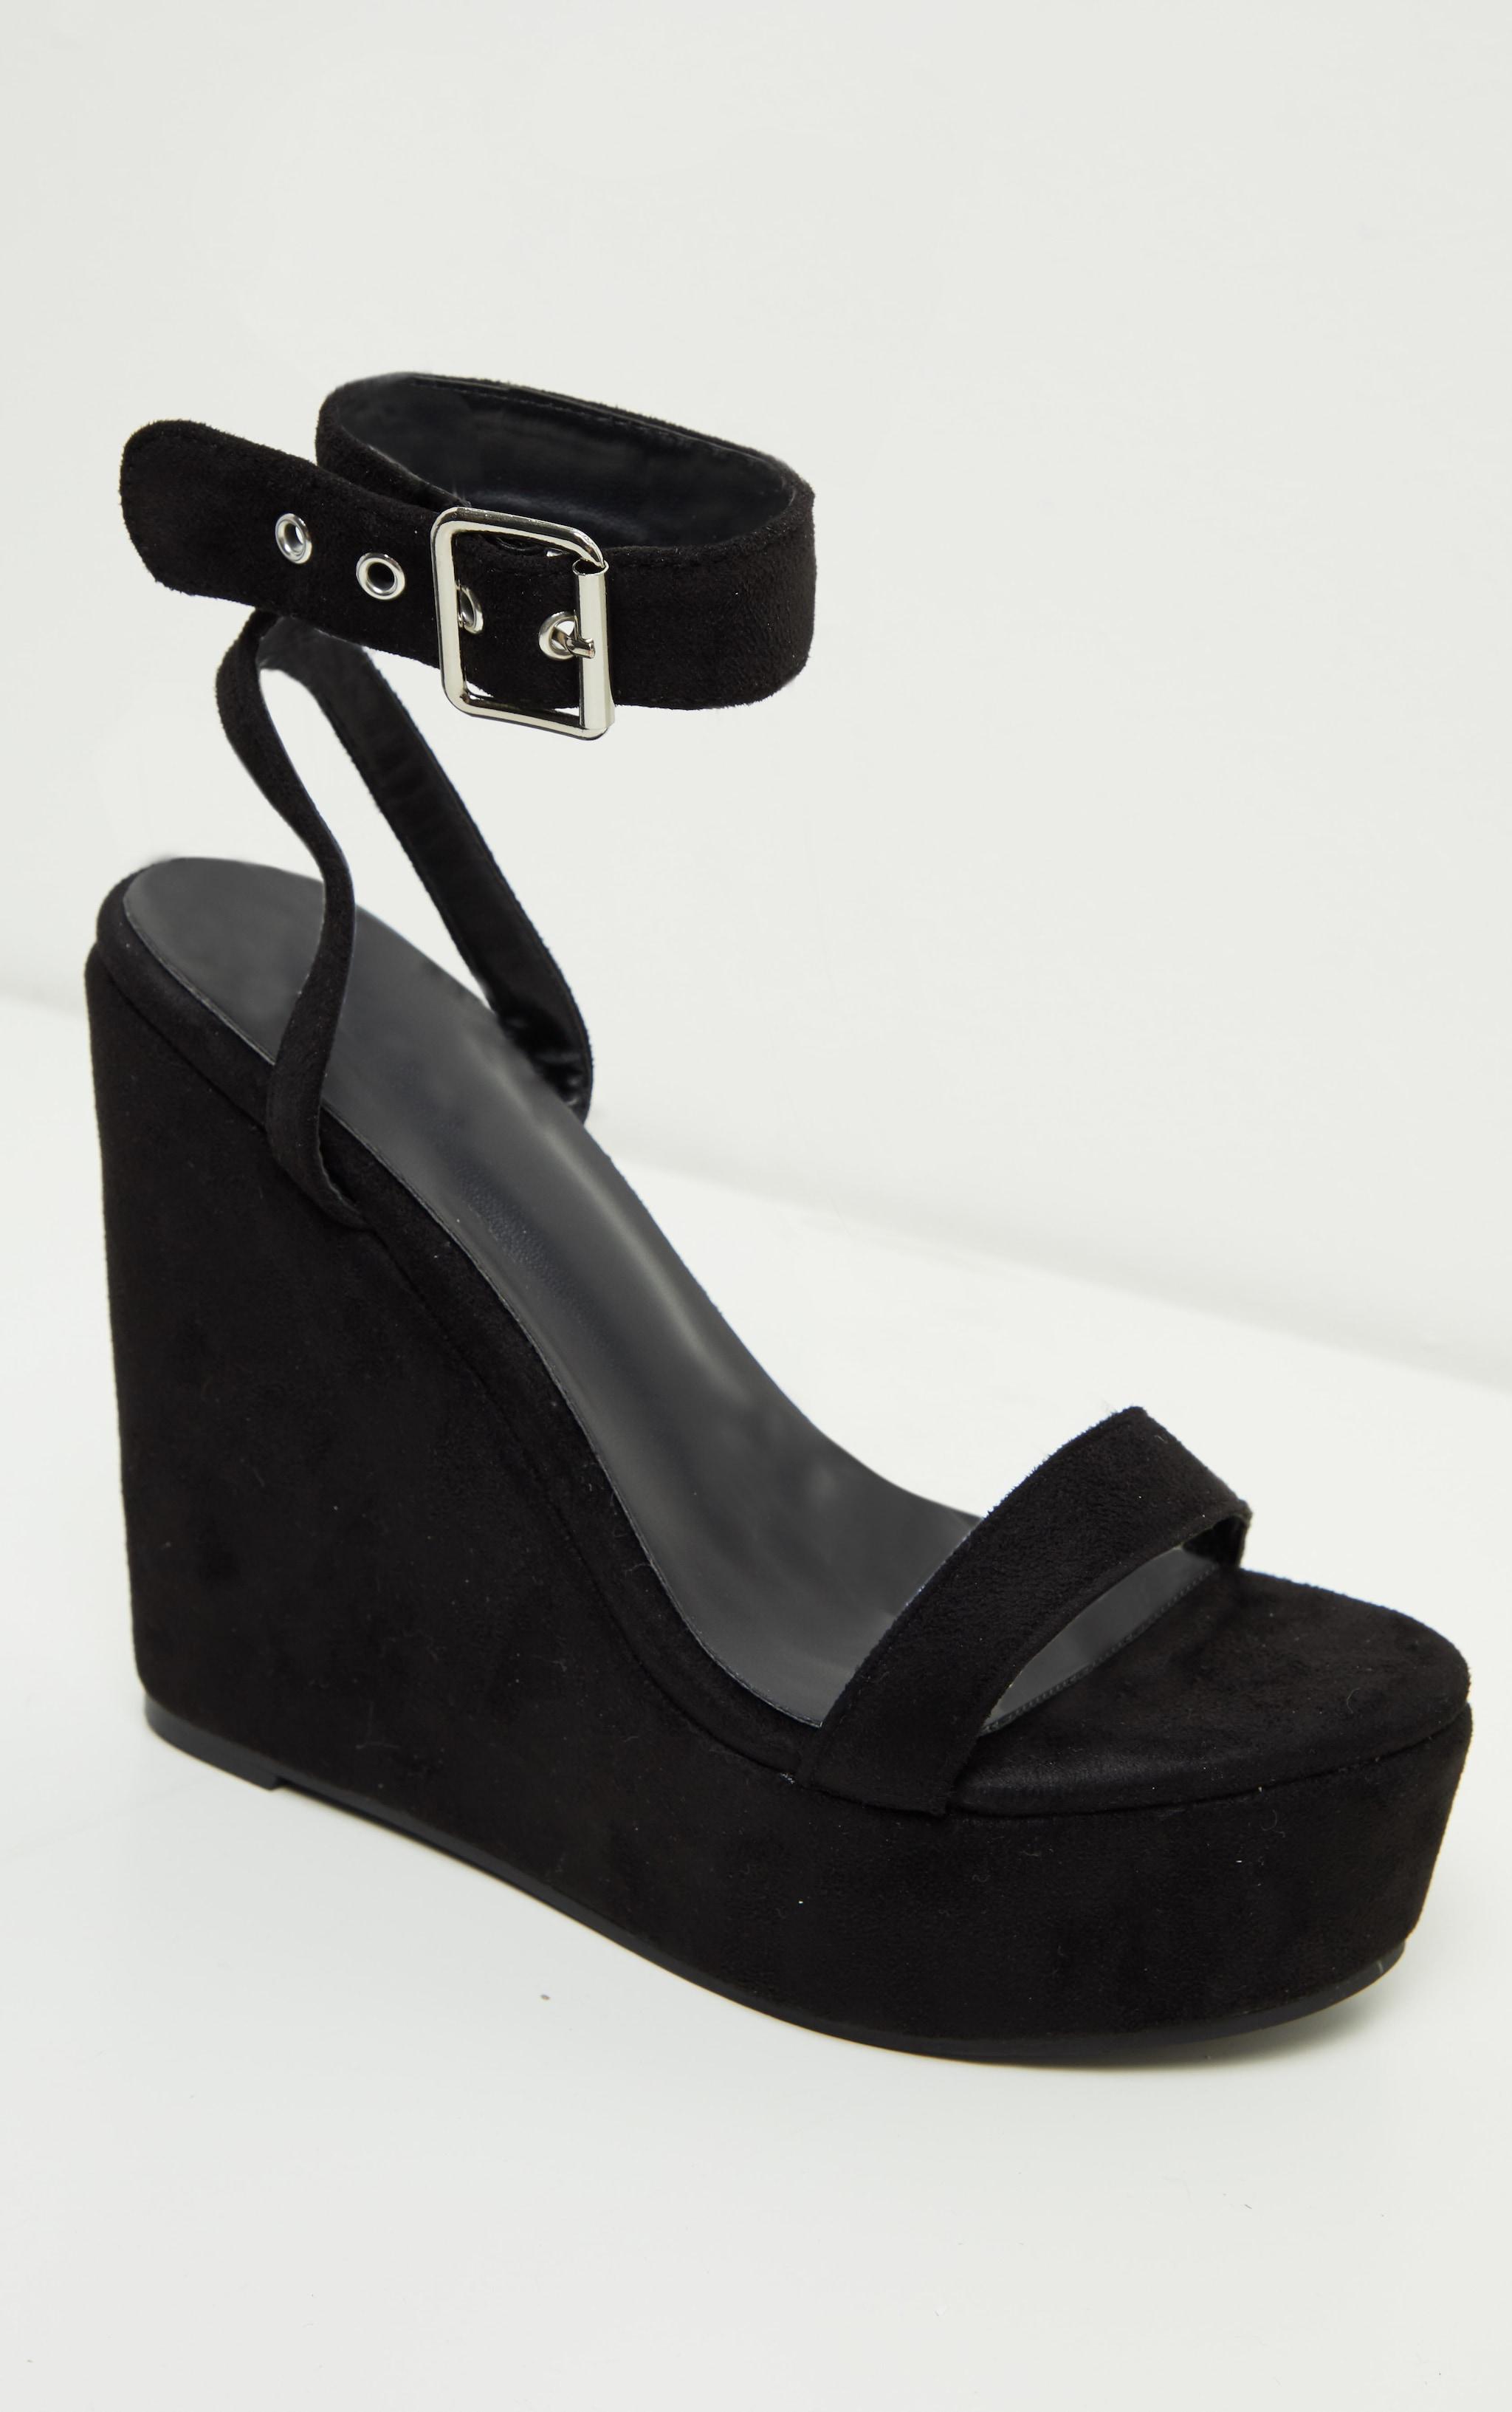 Black Ankle Strap High Wedges